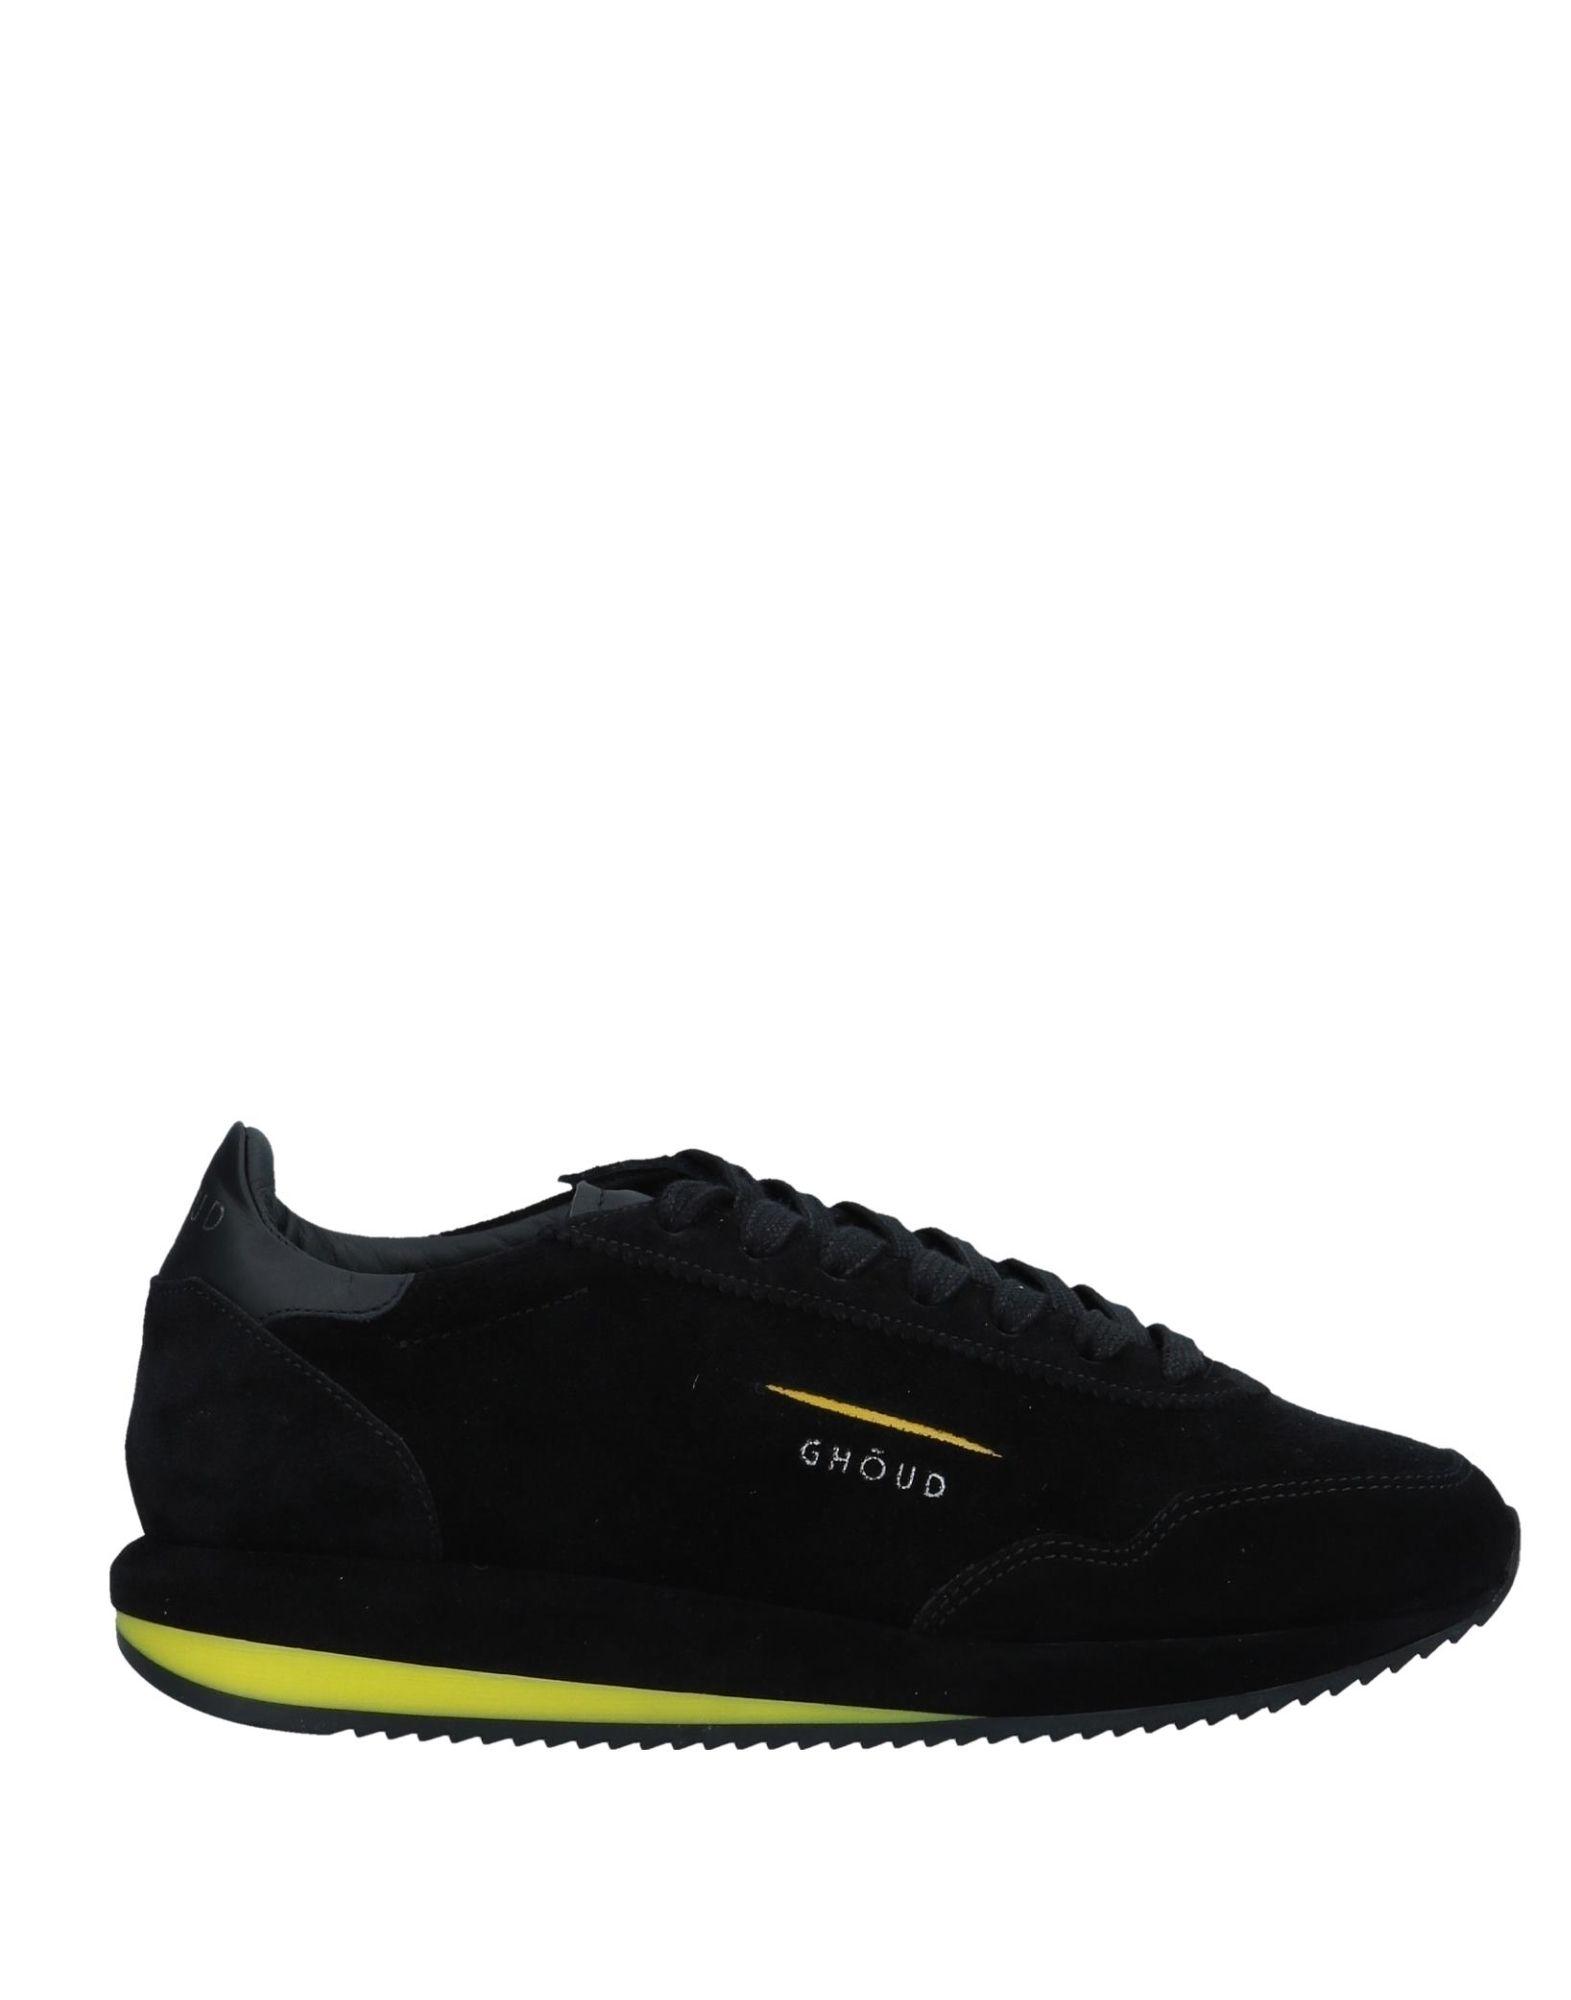 Stilvolle billige Schuhe Ghōud Venice Sneakers Damen  11548984TF